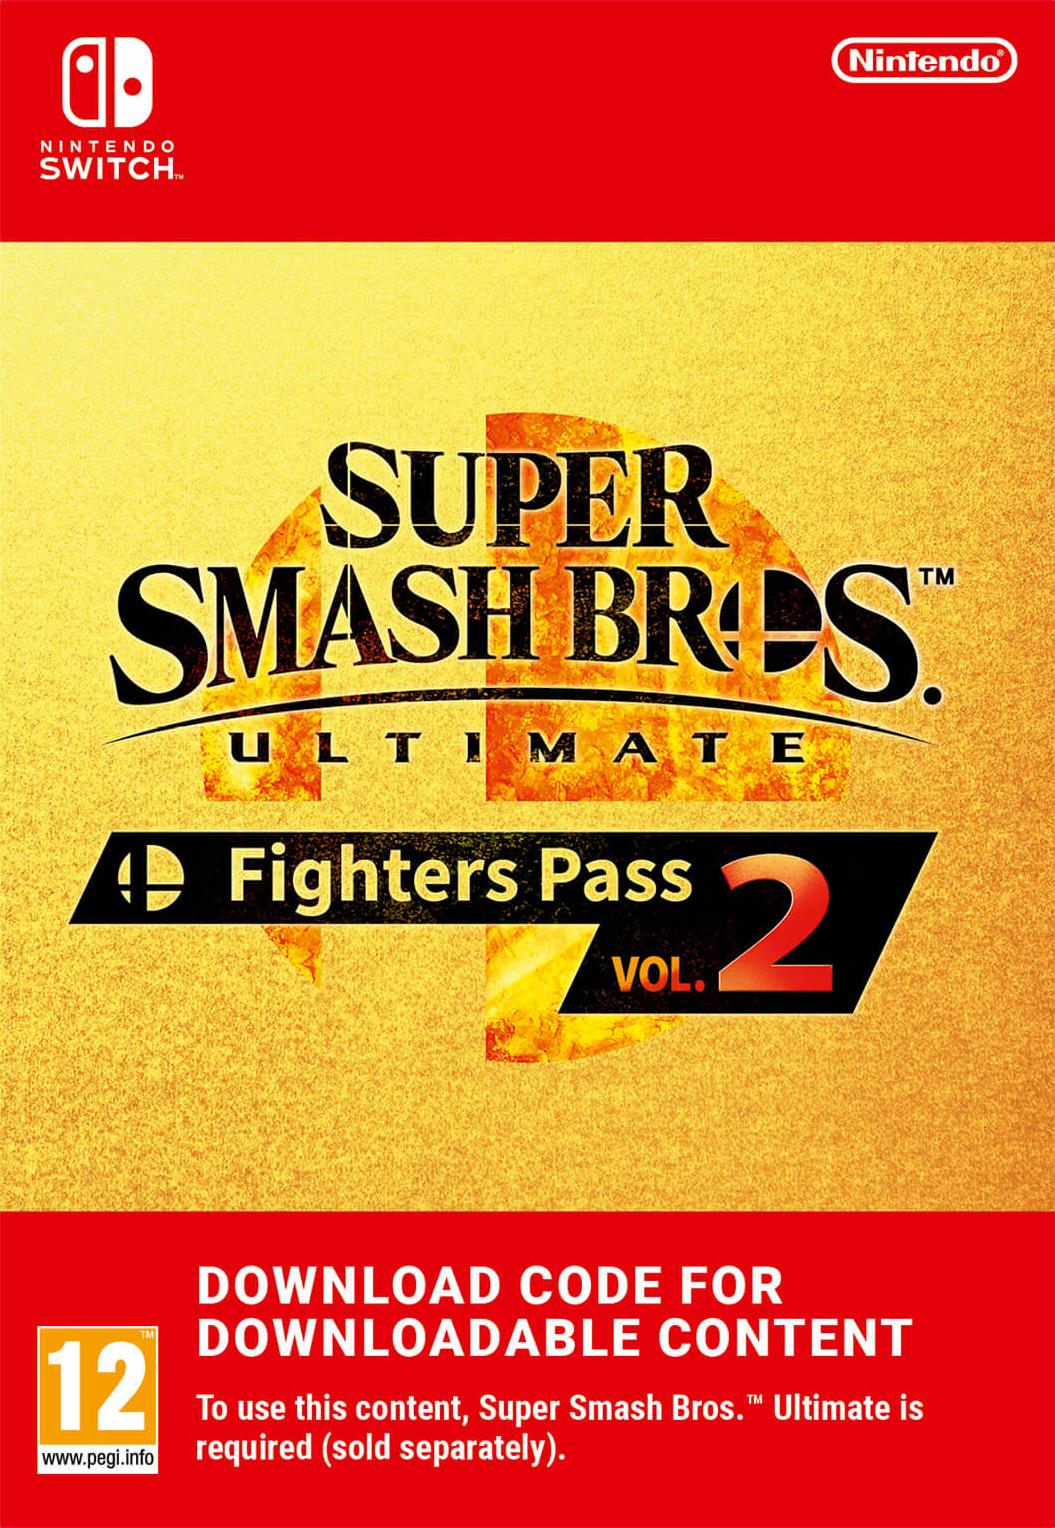 [ebay] Super Smash Bros Ultimate - Fighters Pass Vol. 2 (Nintendo Switch) (personalisiert, Zahlung mit Kreditkarte notwendig)